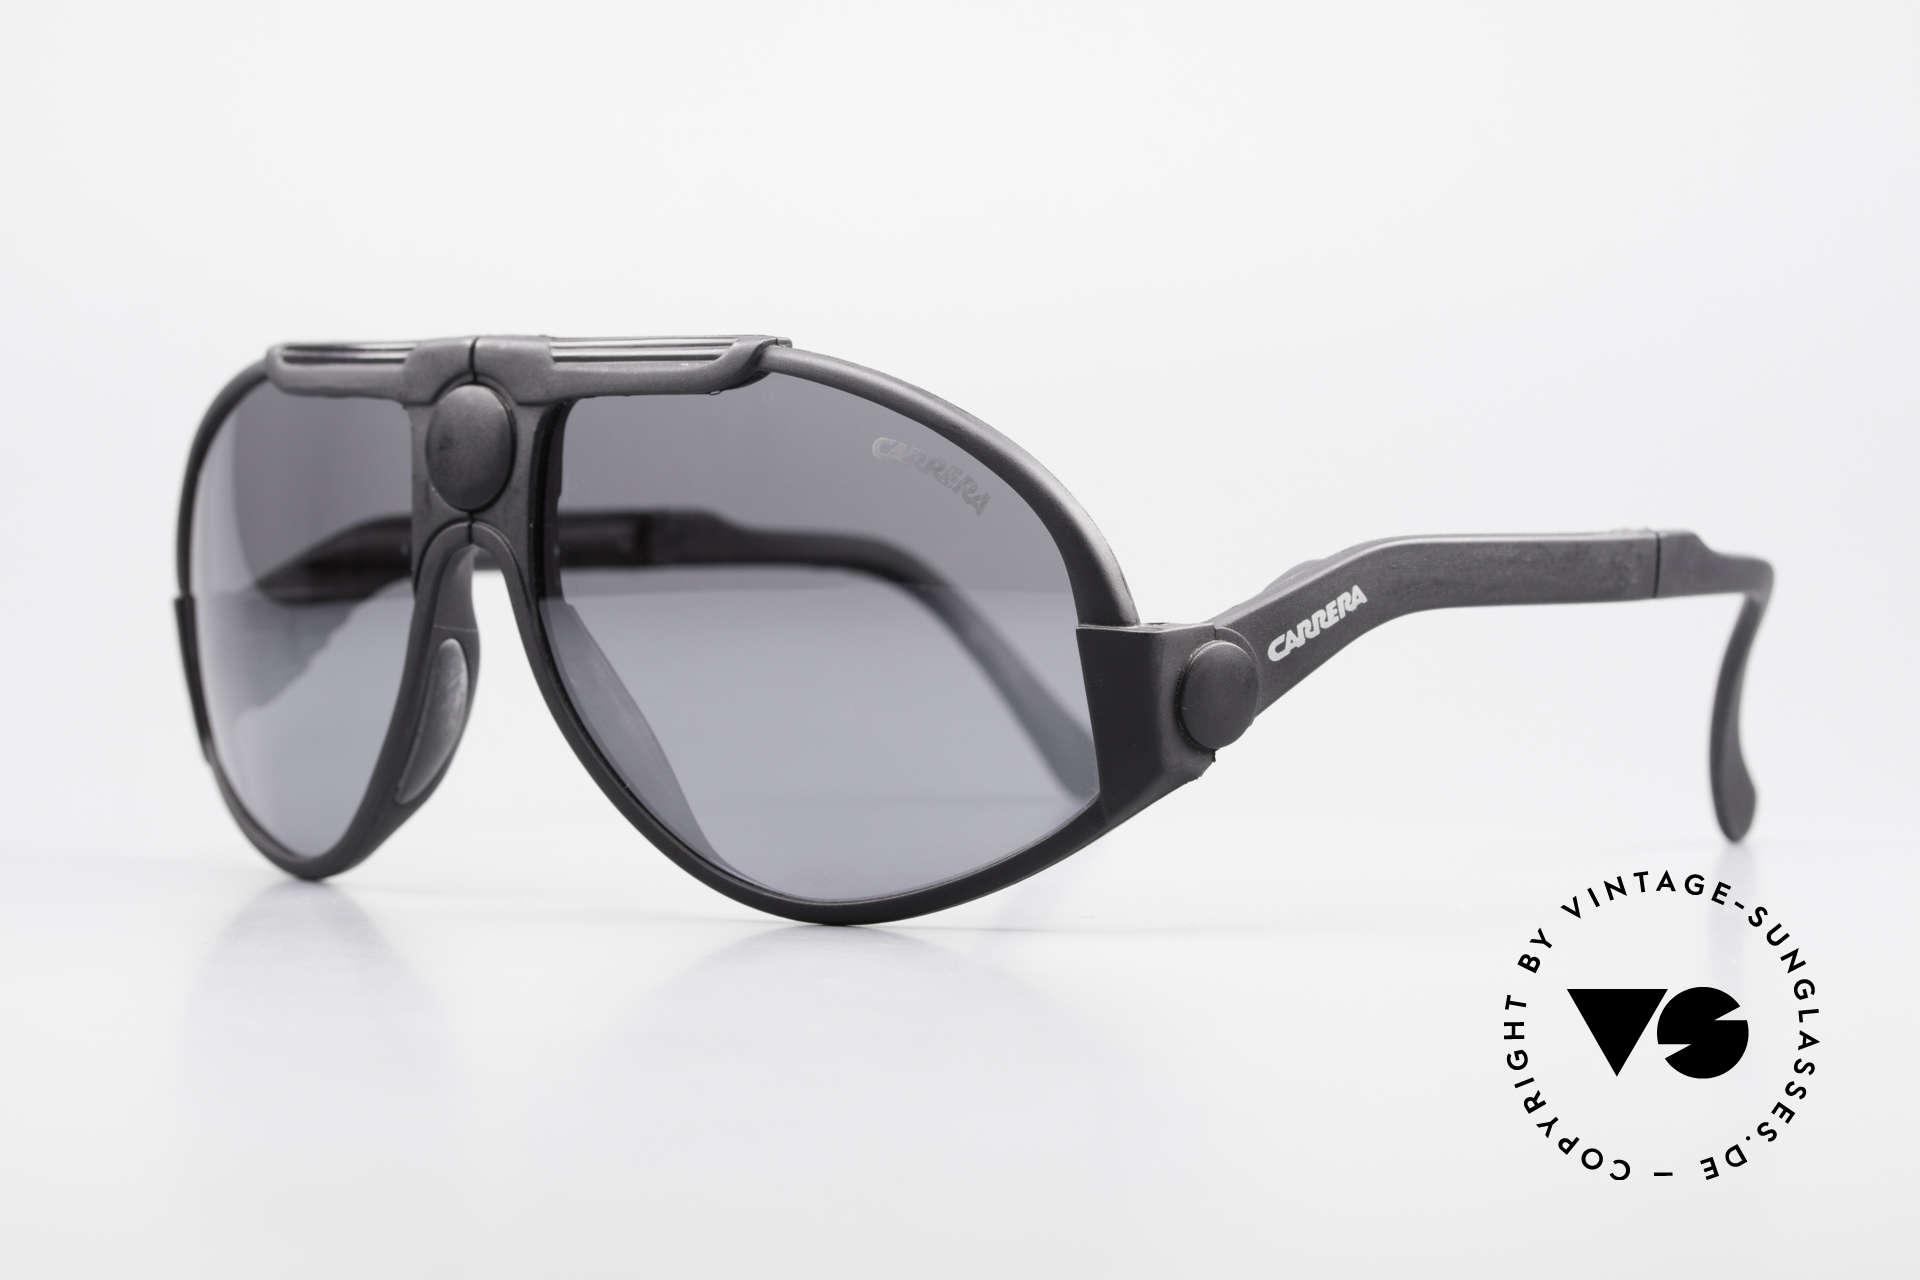 Carrera 5586 Folding Kevlar Sunglasses 90s, high-end Carrera silver-mirrored lenses (100% UV), Made for Men